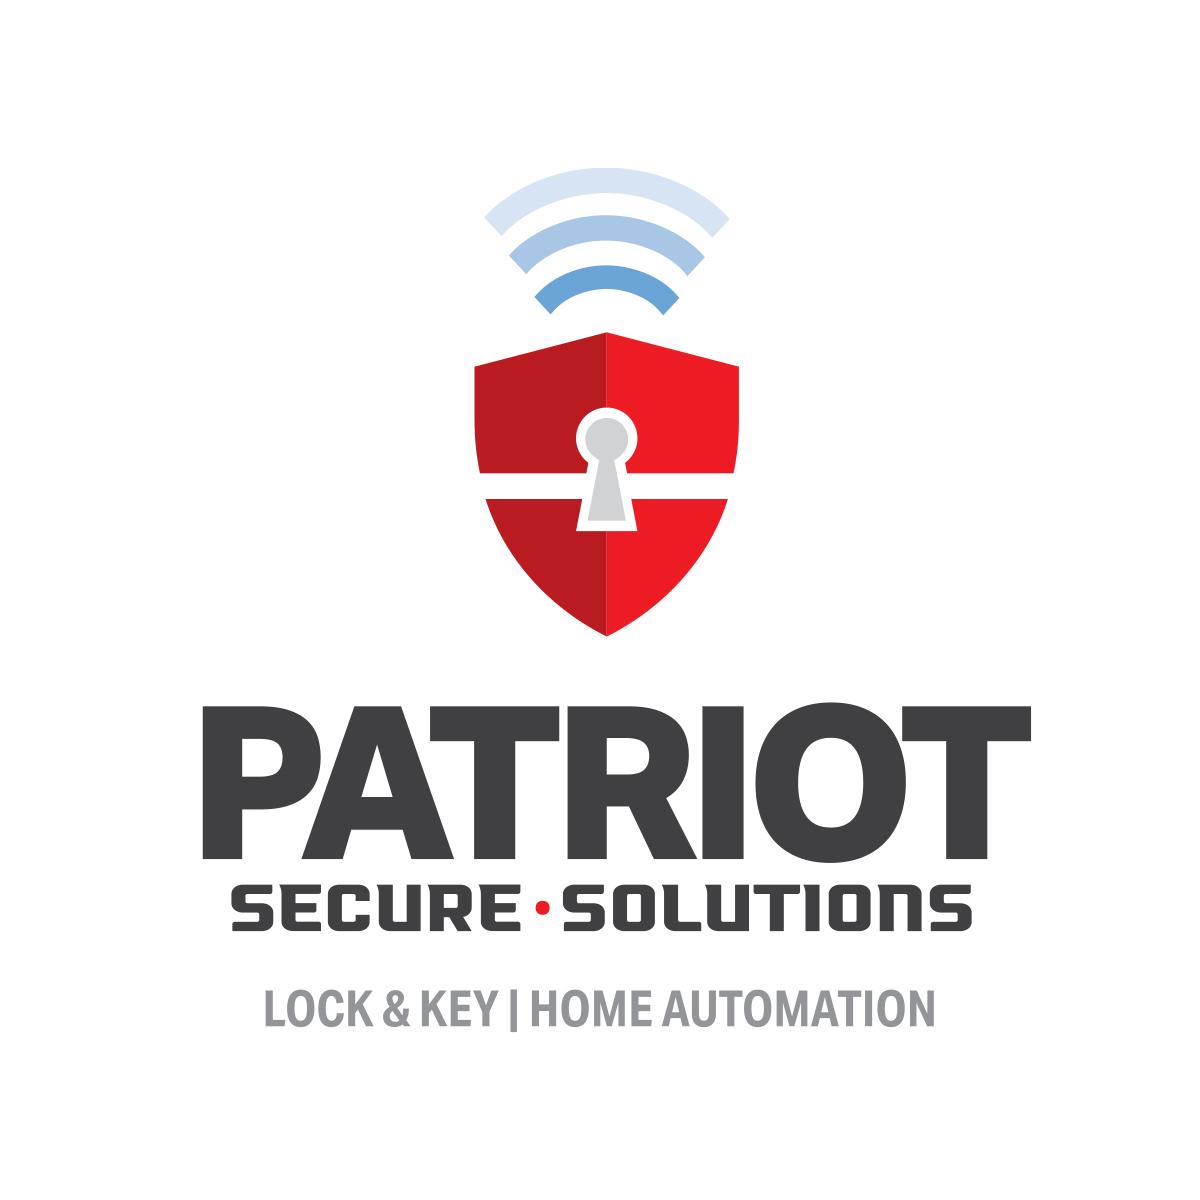 Patriot Lock and Key